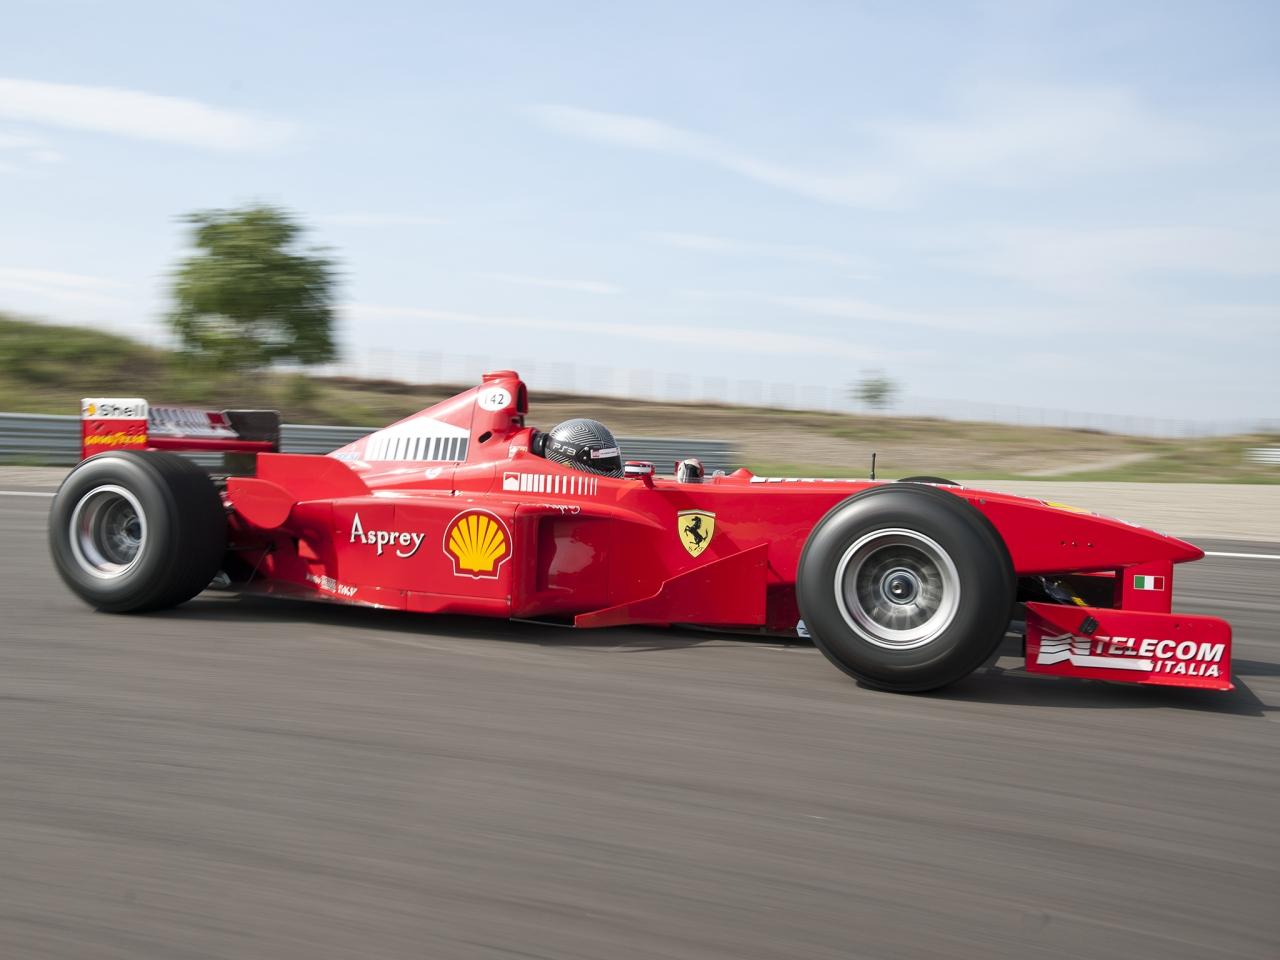 Ferrari F300 Formula 1 - 1280x960